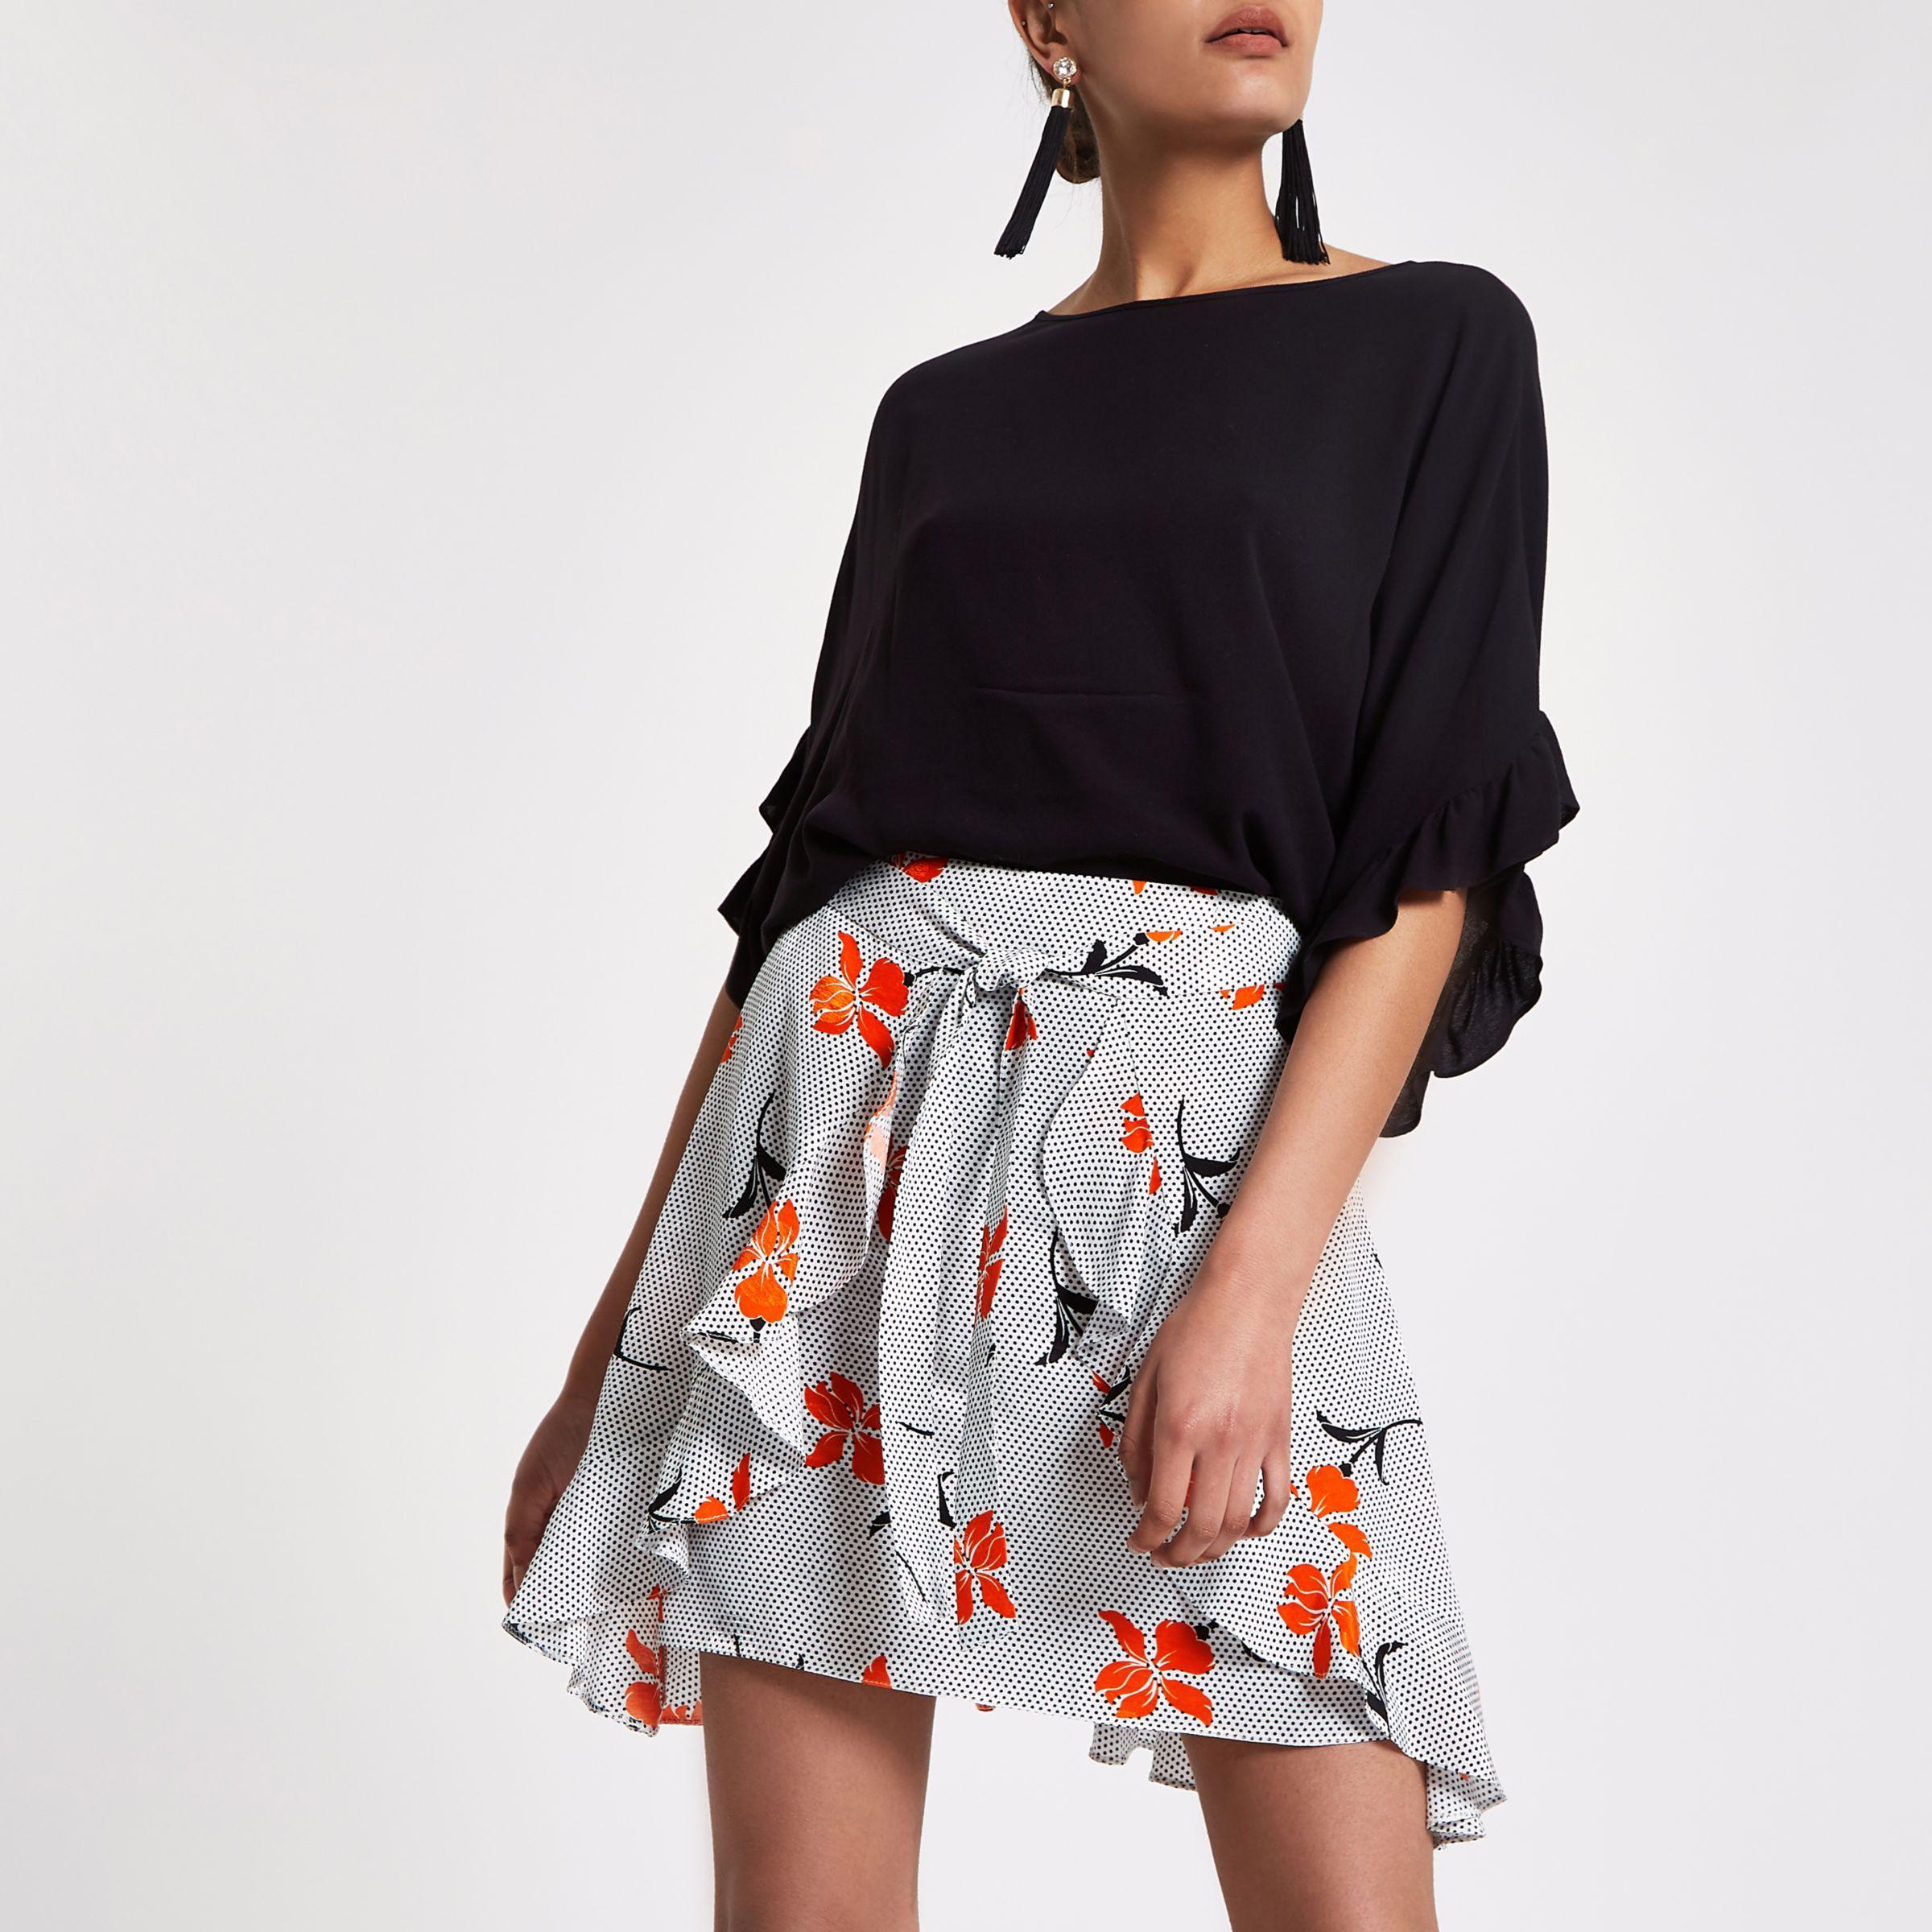 9713b1e1b River Island Black Floral Spot Wrap Tie Front Mini Skirt in Black - Lyst